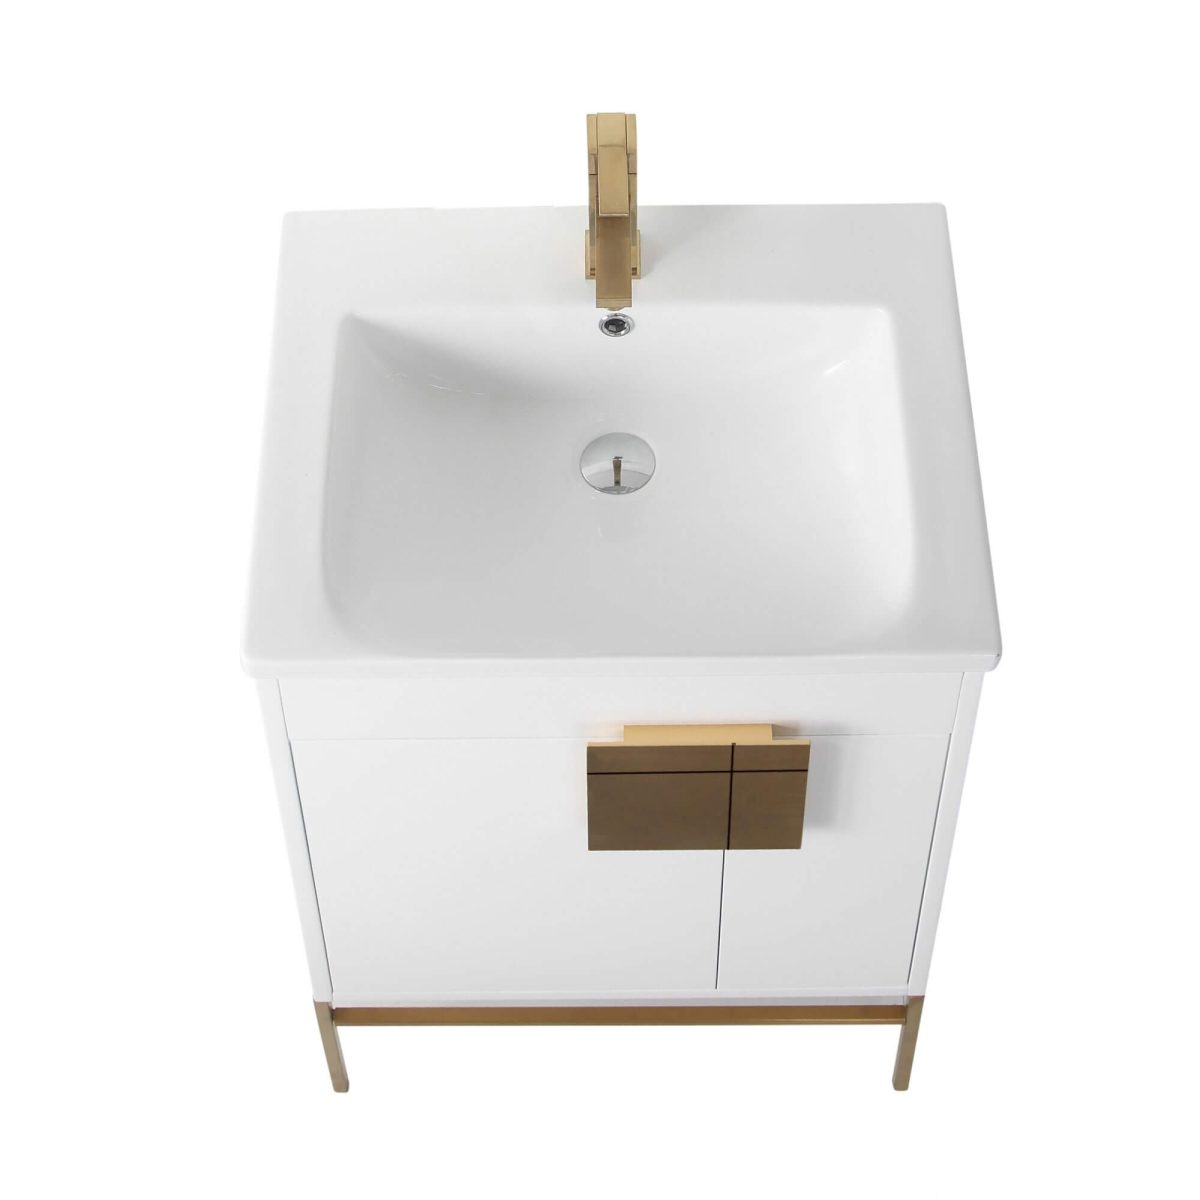 "Shawbridge 24"" Modern Bathroom Vanity  White with Satin Brass Hardware"